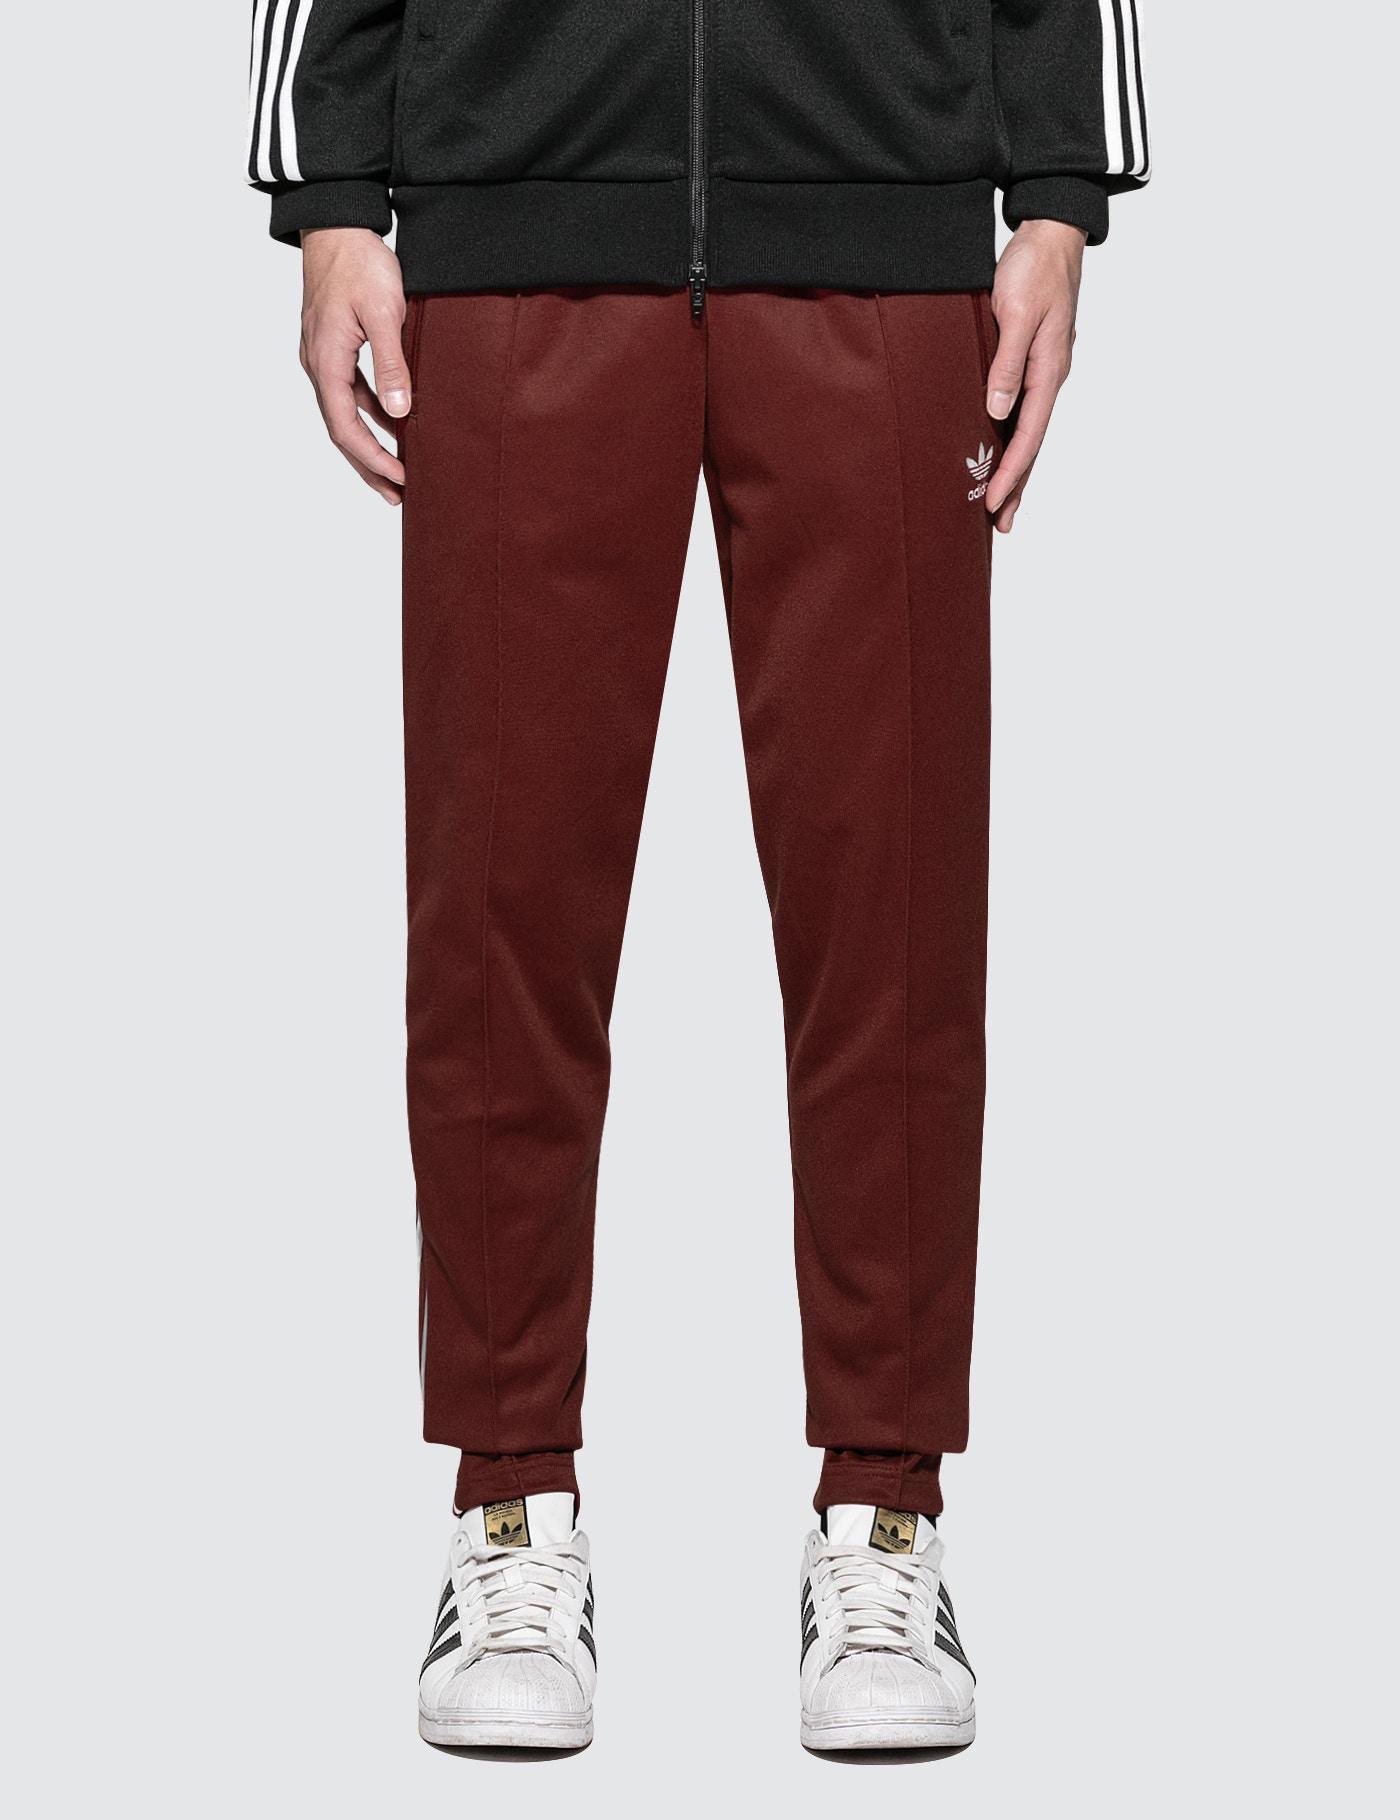 ff4e37a3e8ce Lyst - adidas Originals Beckenbauer Trackpants in Red for Men